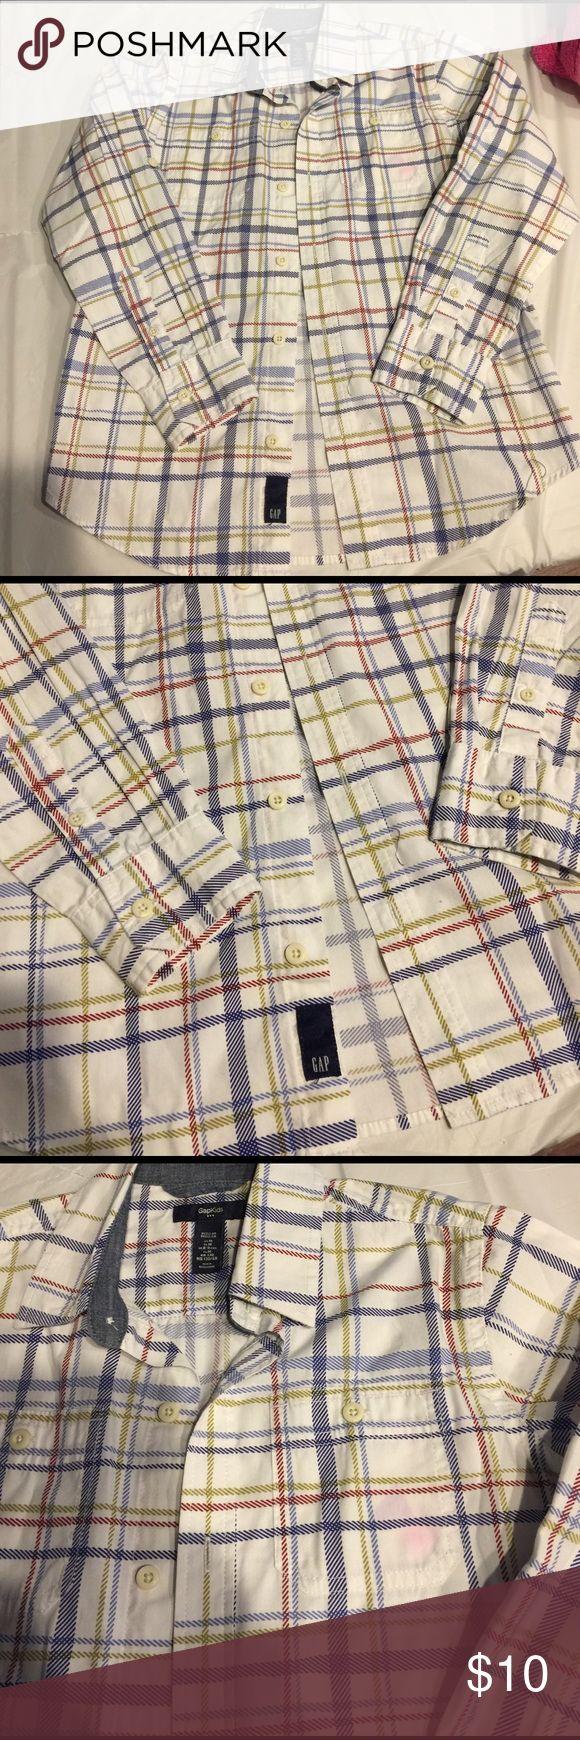 Gap kids boys shirt Gap kids boys shirt size 8-9 no trades GAP Shirts & Tops Polos